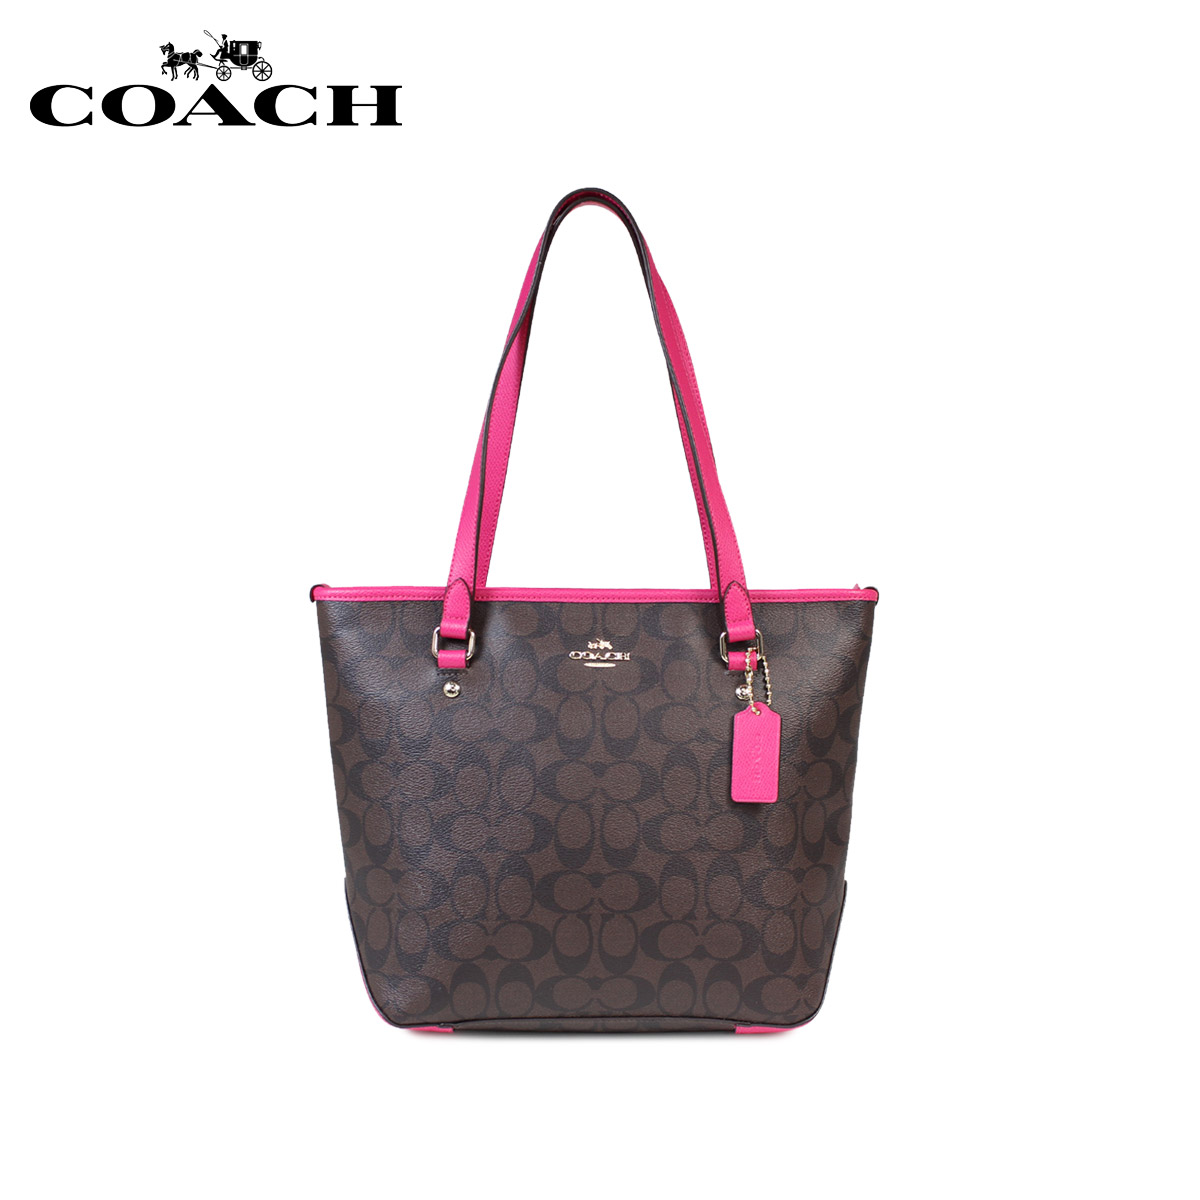 a78ce60c39bd1 where can i buy coach tote bag coach bag lady f34603 brown x pink ruby 1